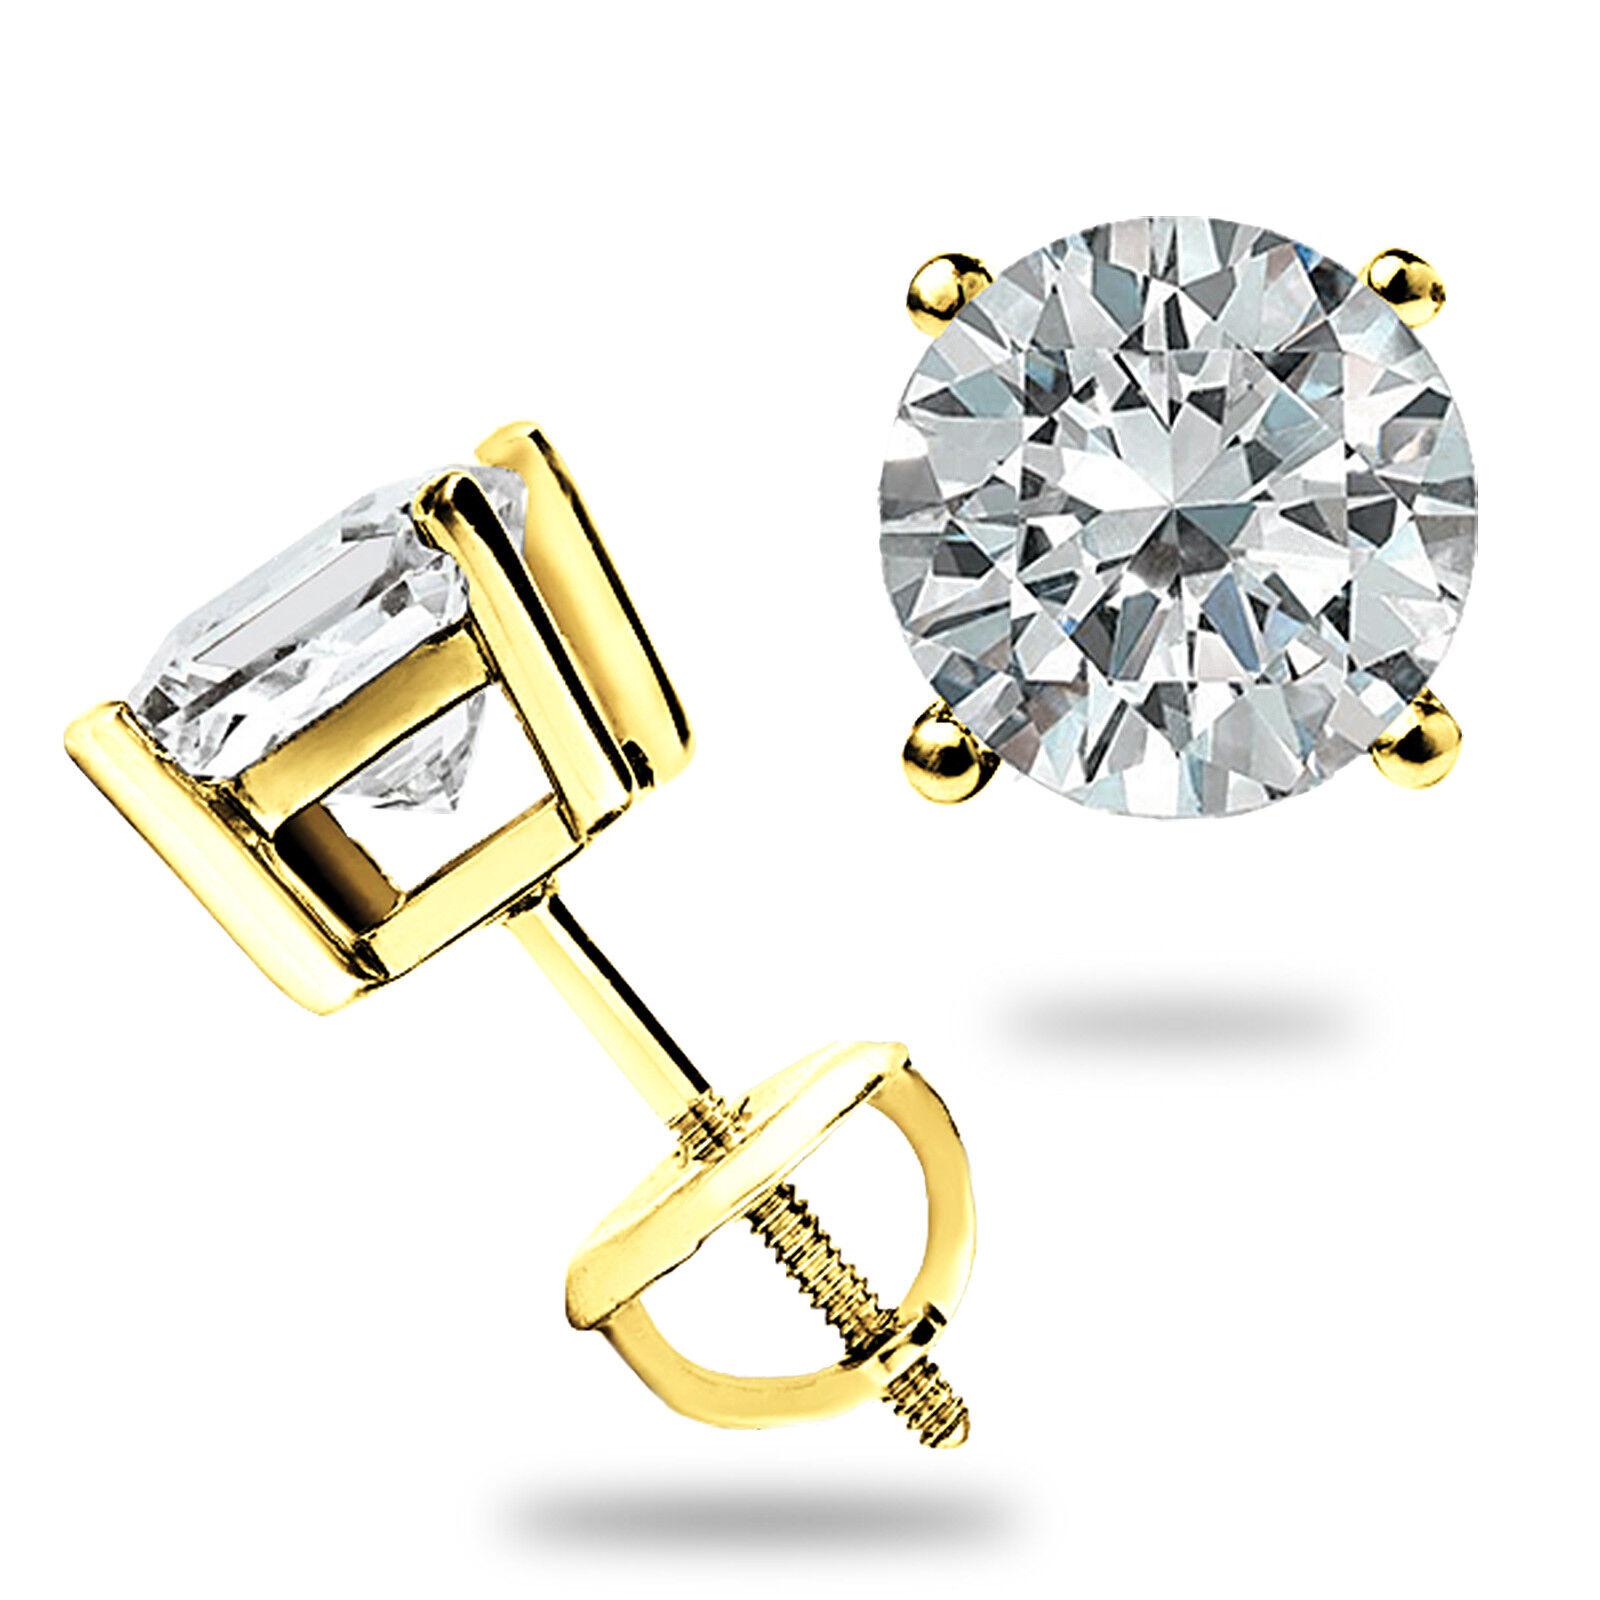 1.75 Ct Princess Cut Diamond Earrings in Solid 14k White Gold Screw Back Studs